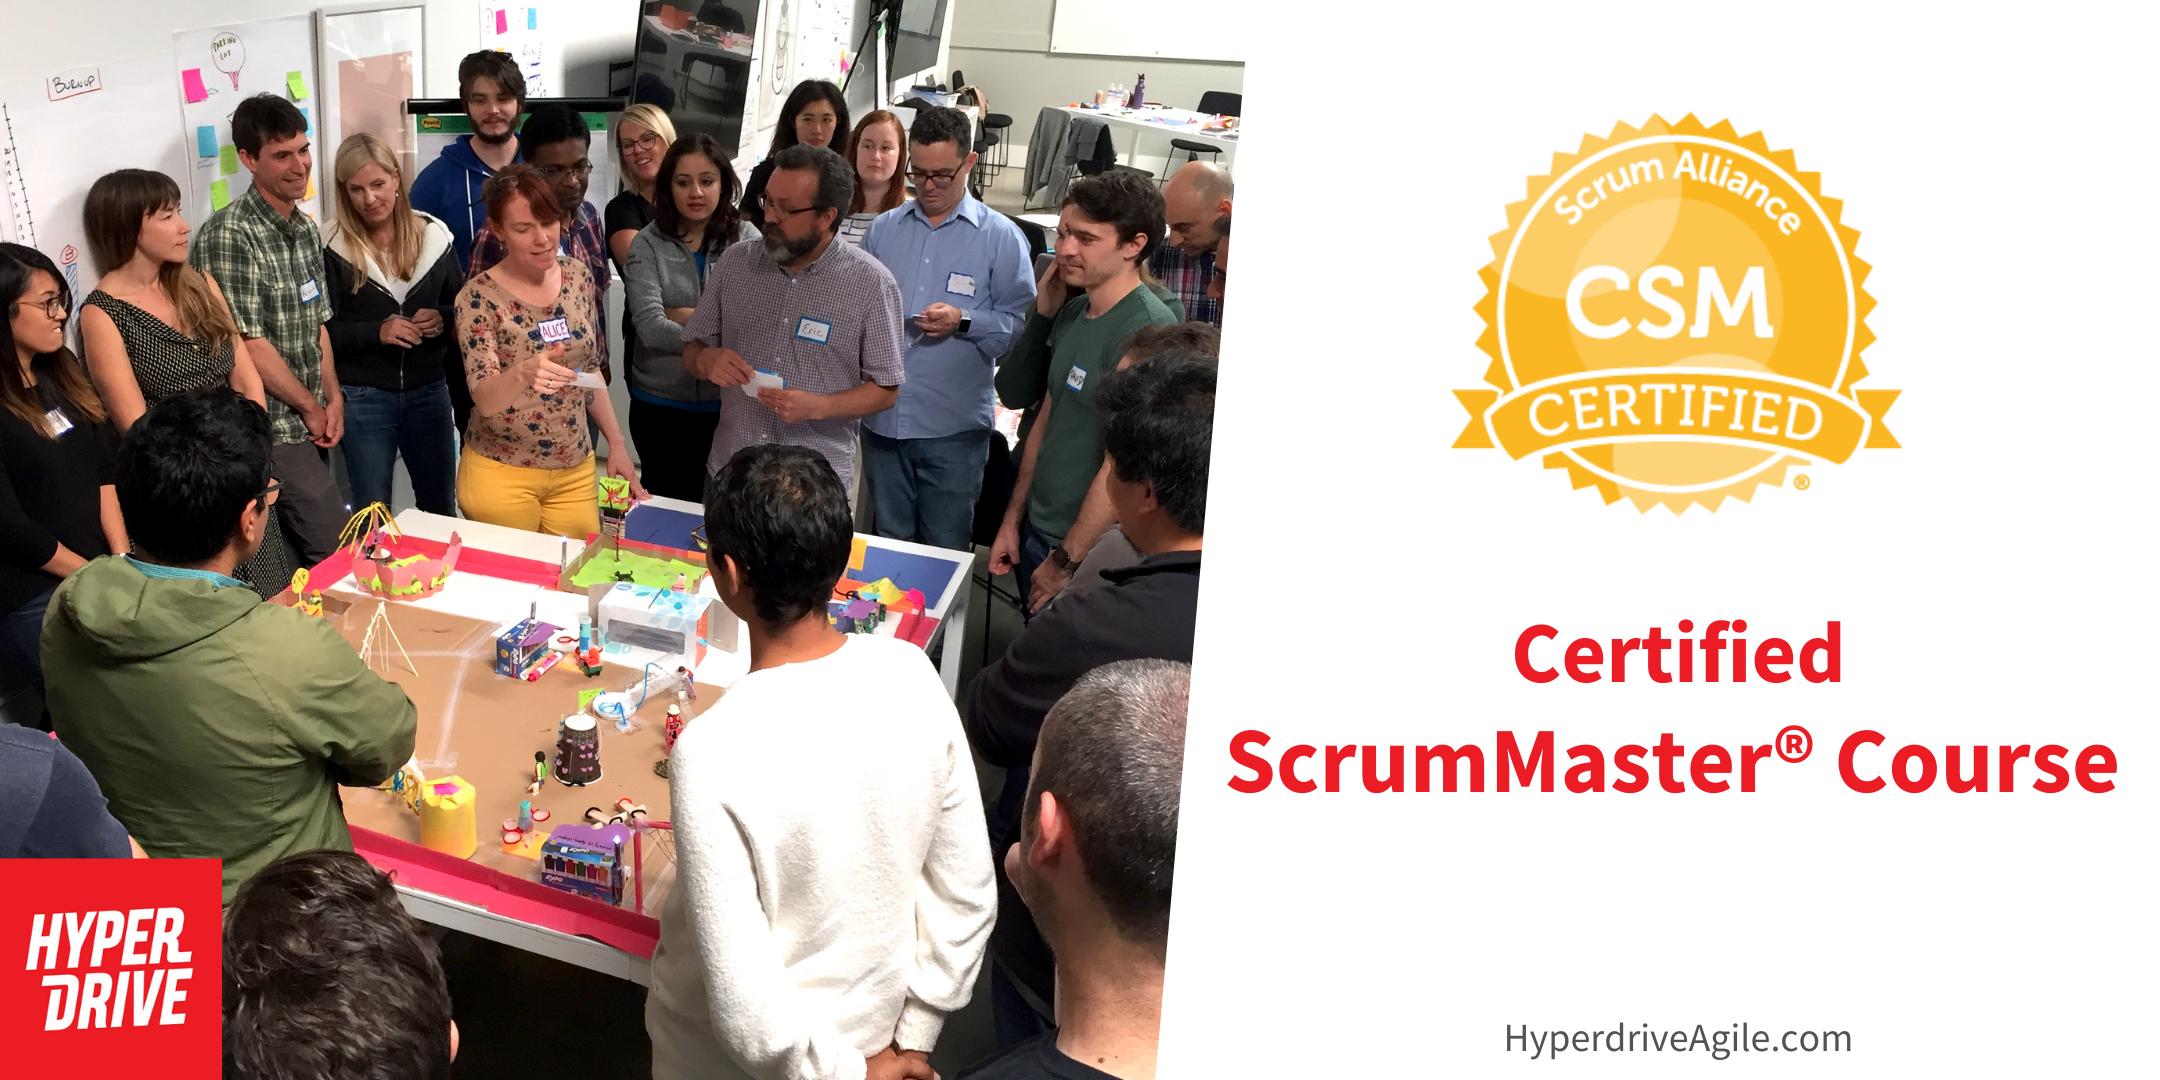 Certified ScrumMaster® Course (CSM) - San Francisco, CA